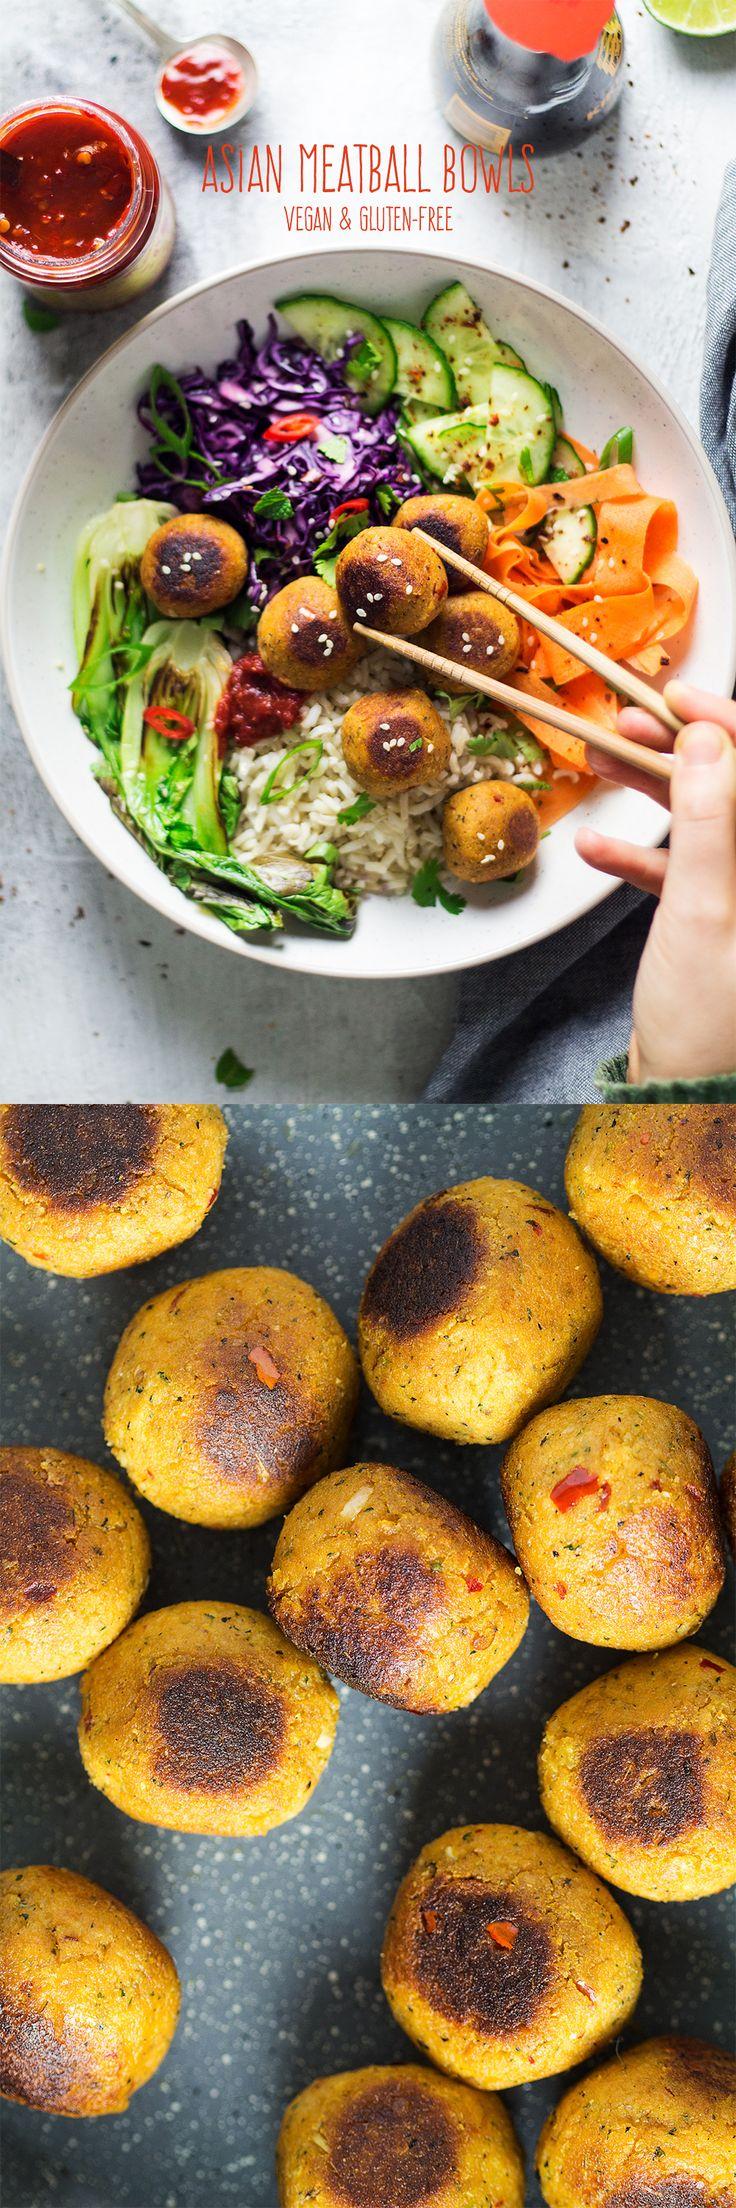 Asian Meatball Bowls